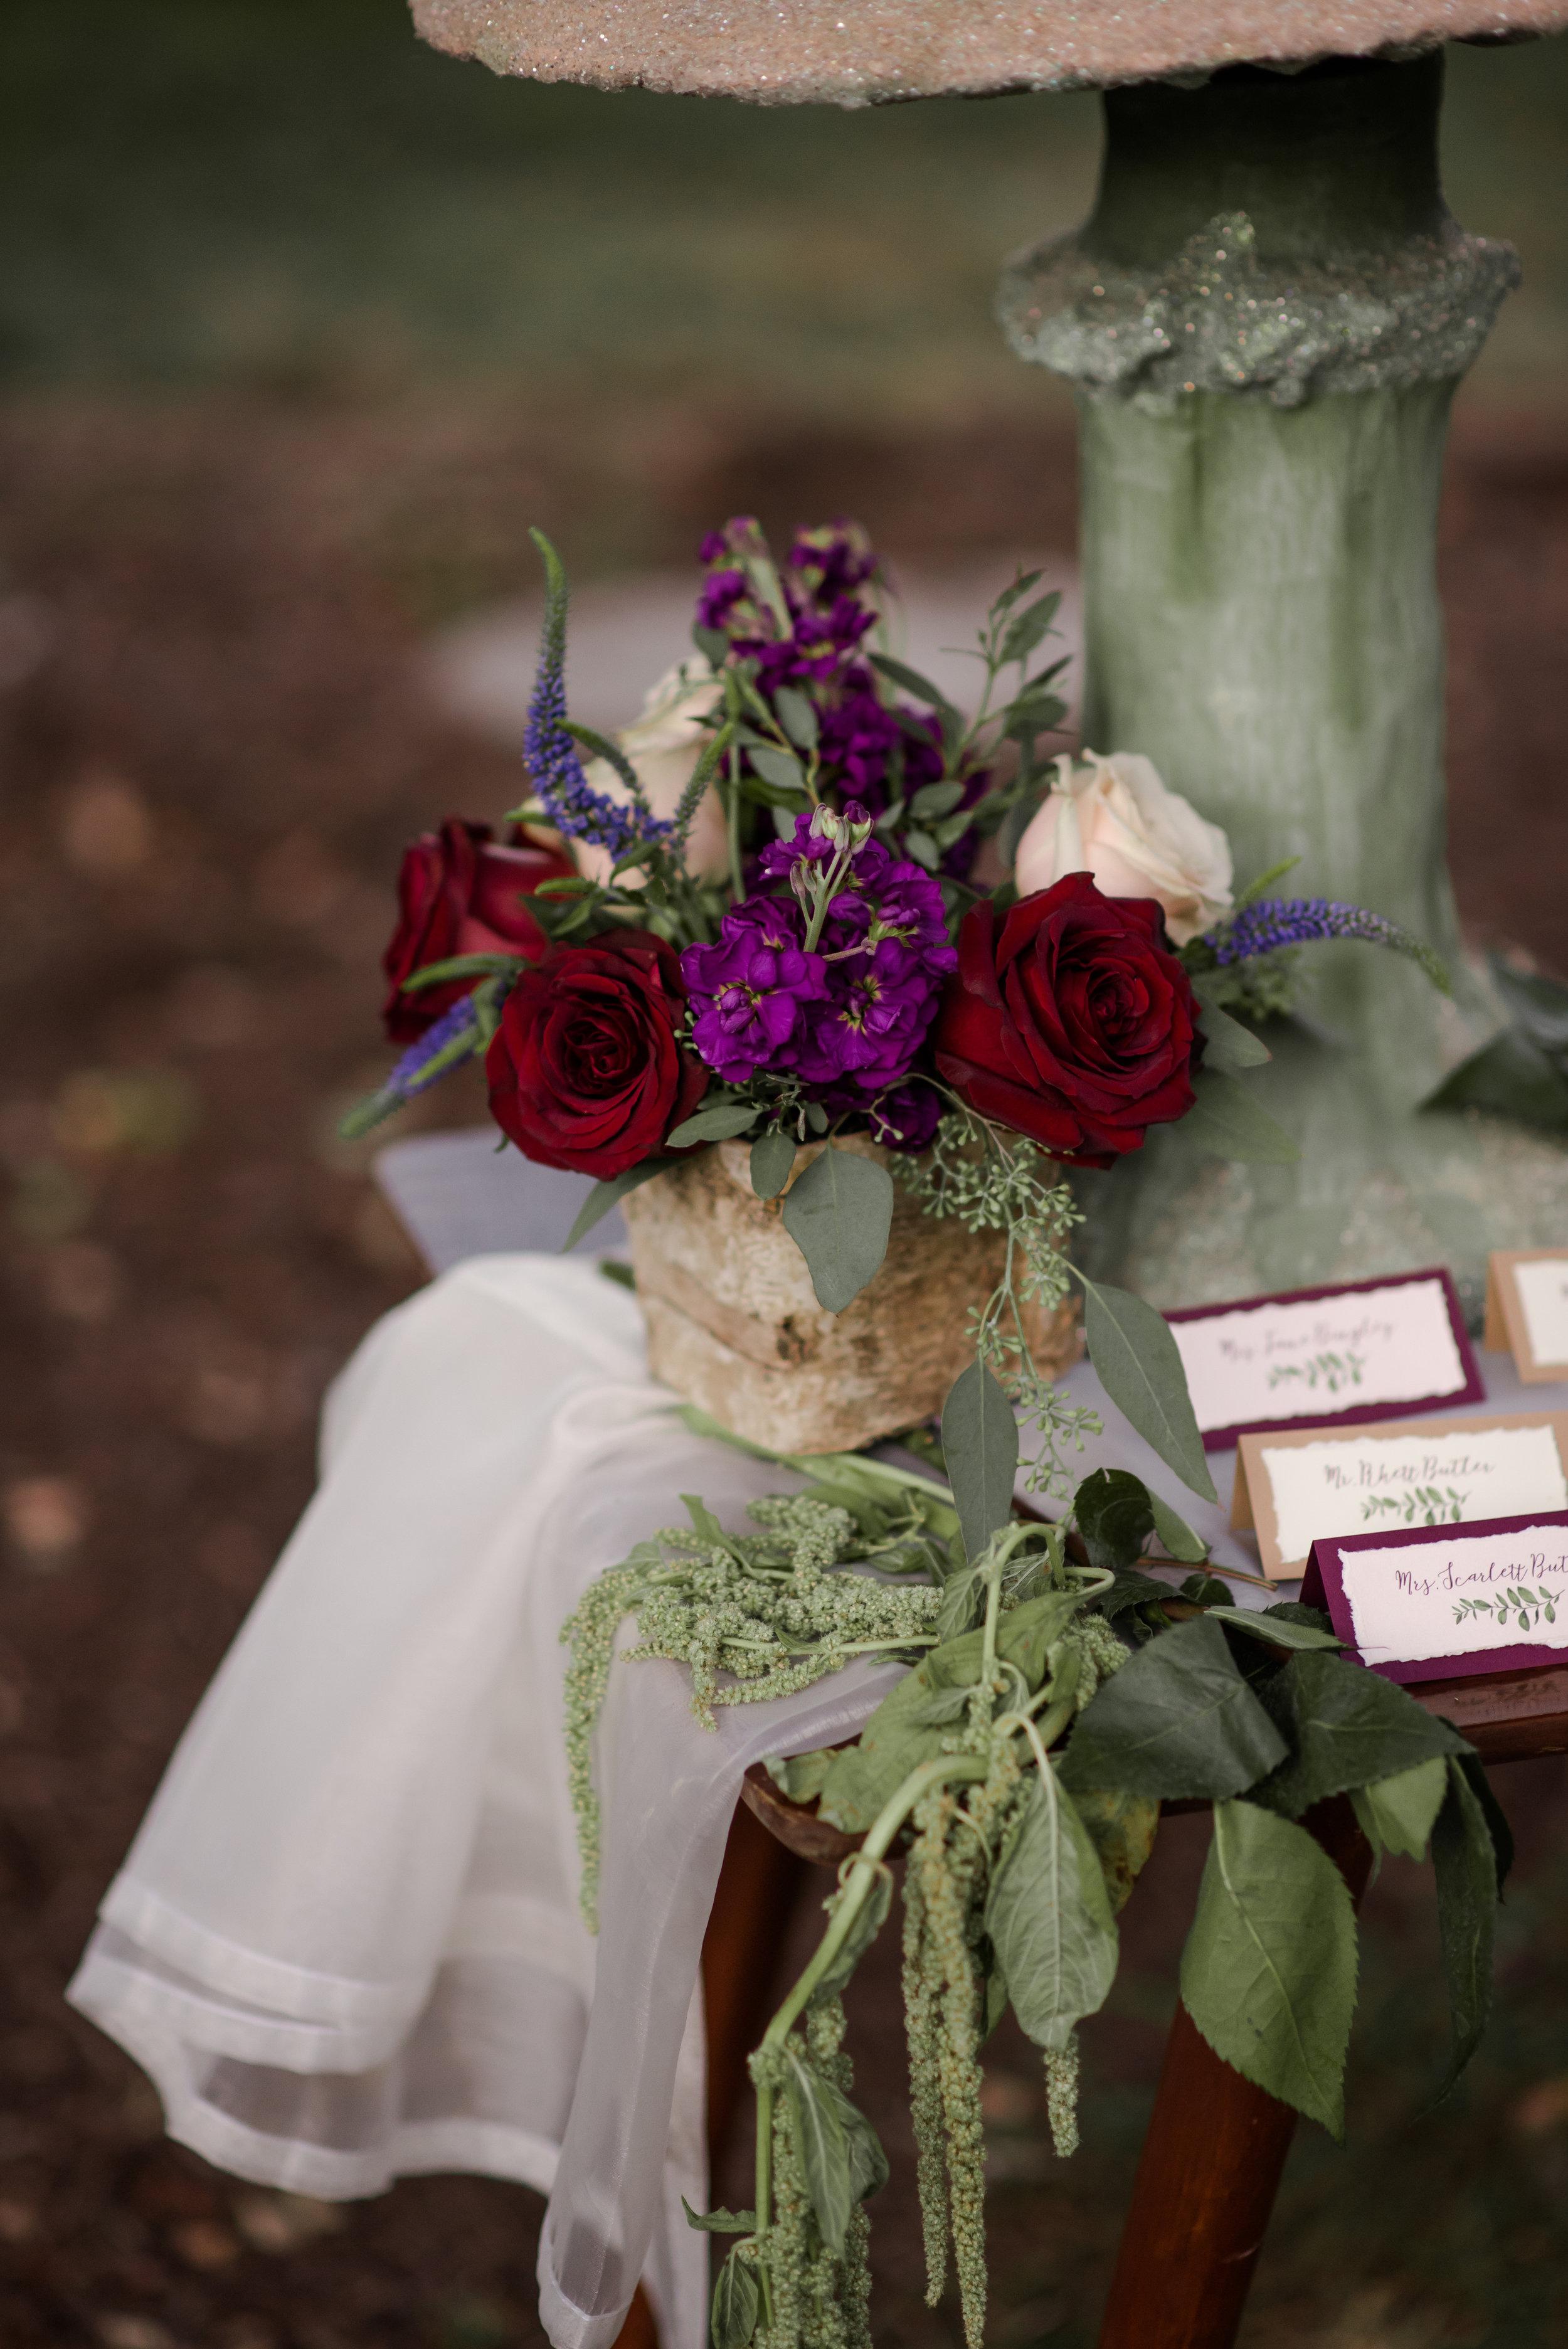 midsummers-eve-wedding-floral-blush-dress-david-tutera-cary-hill-plantation-photo-virginia-bride-296.jpg